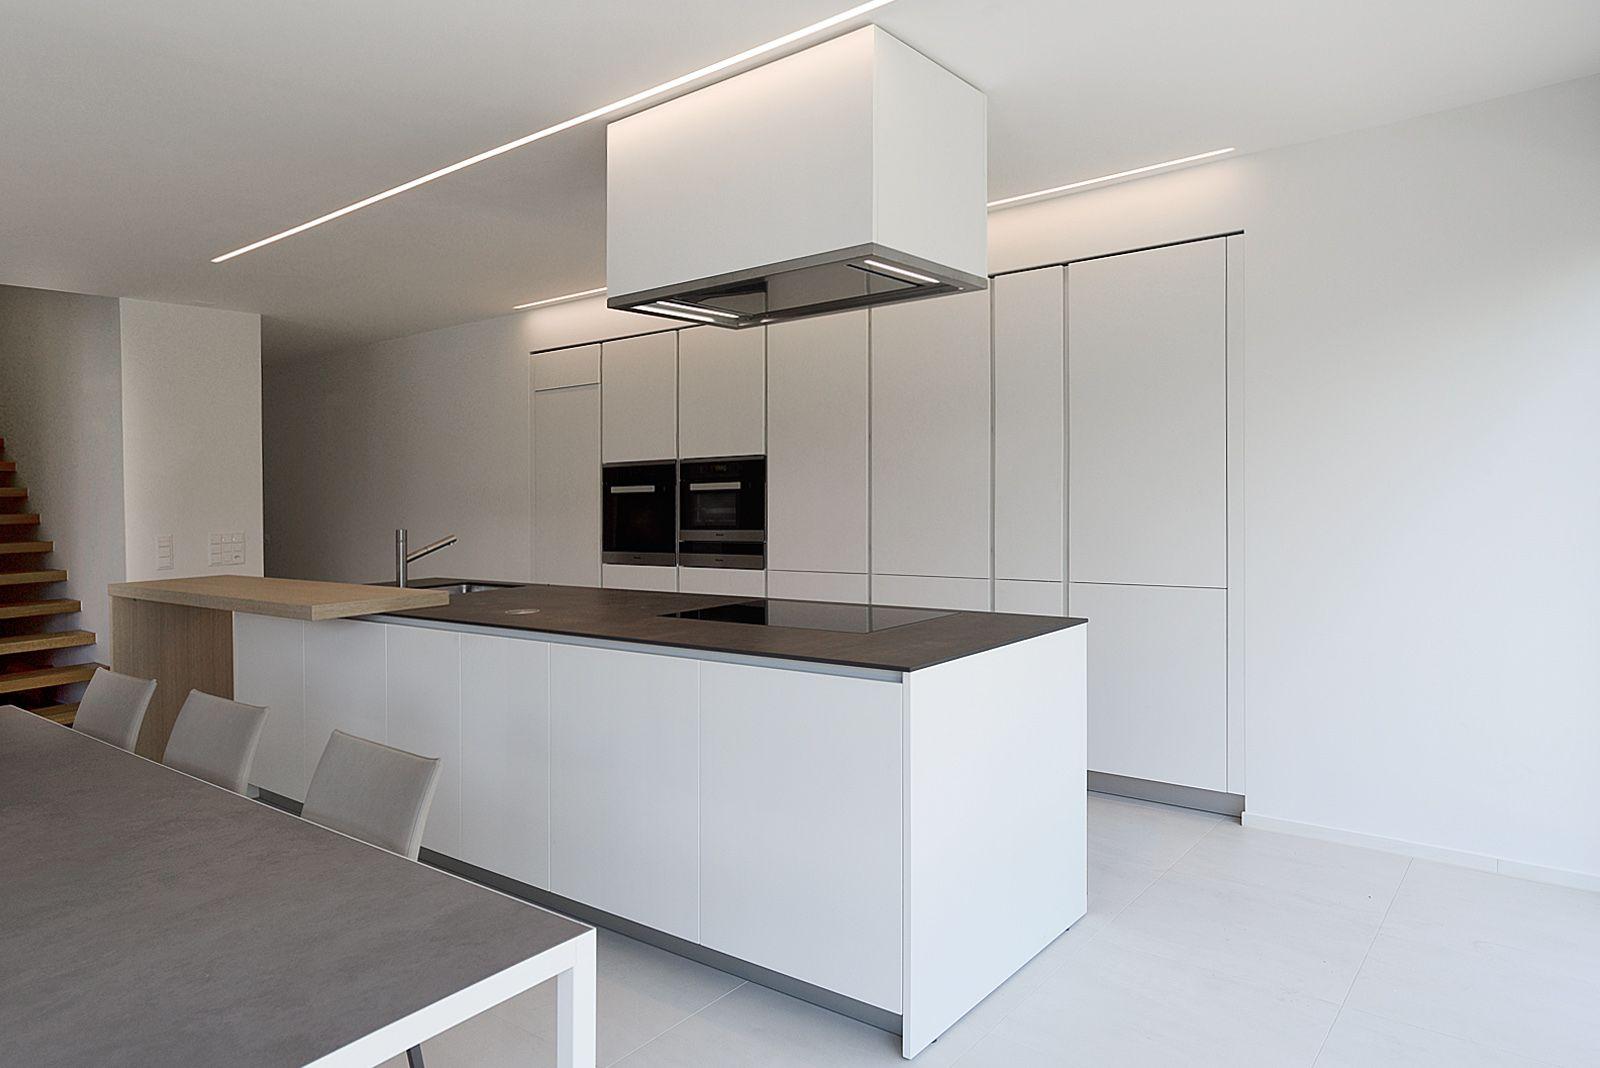 Cucina varenna alea con piano snack in legno di rovere bellissima cucina moderna di design - Cucina moderna design ...